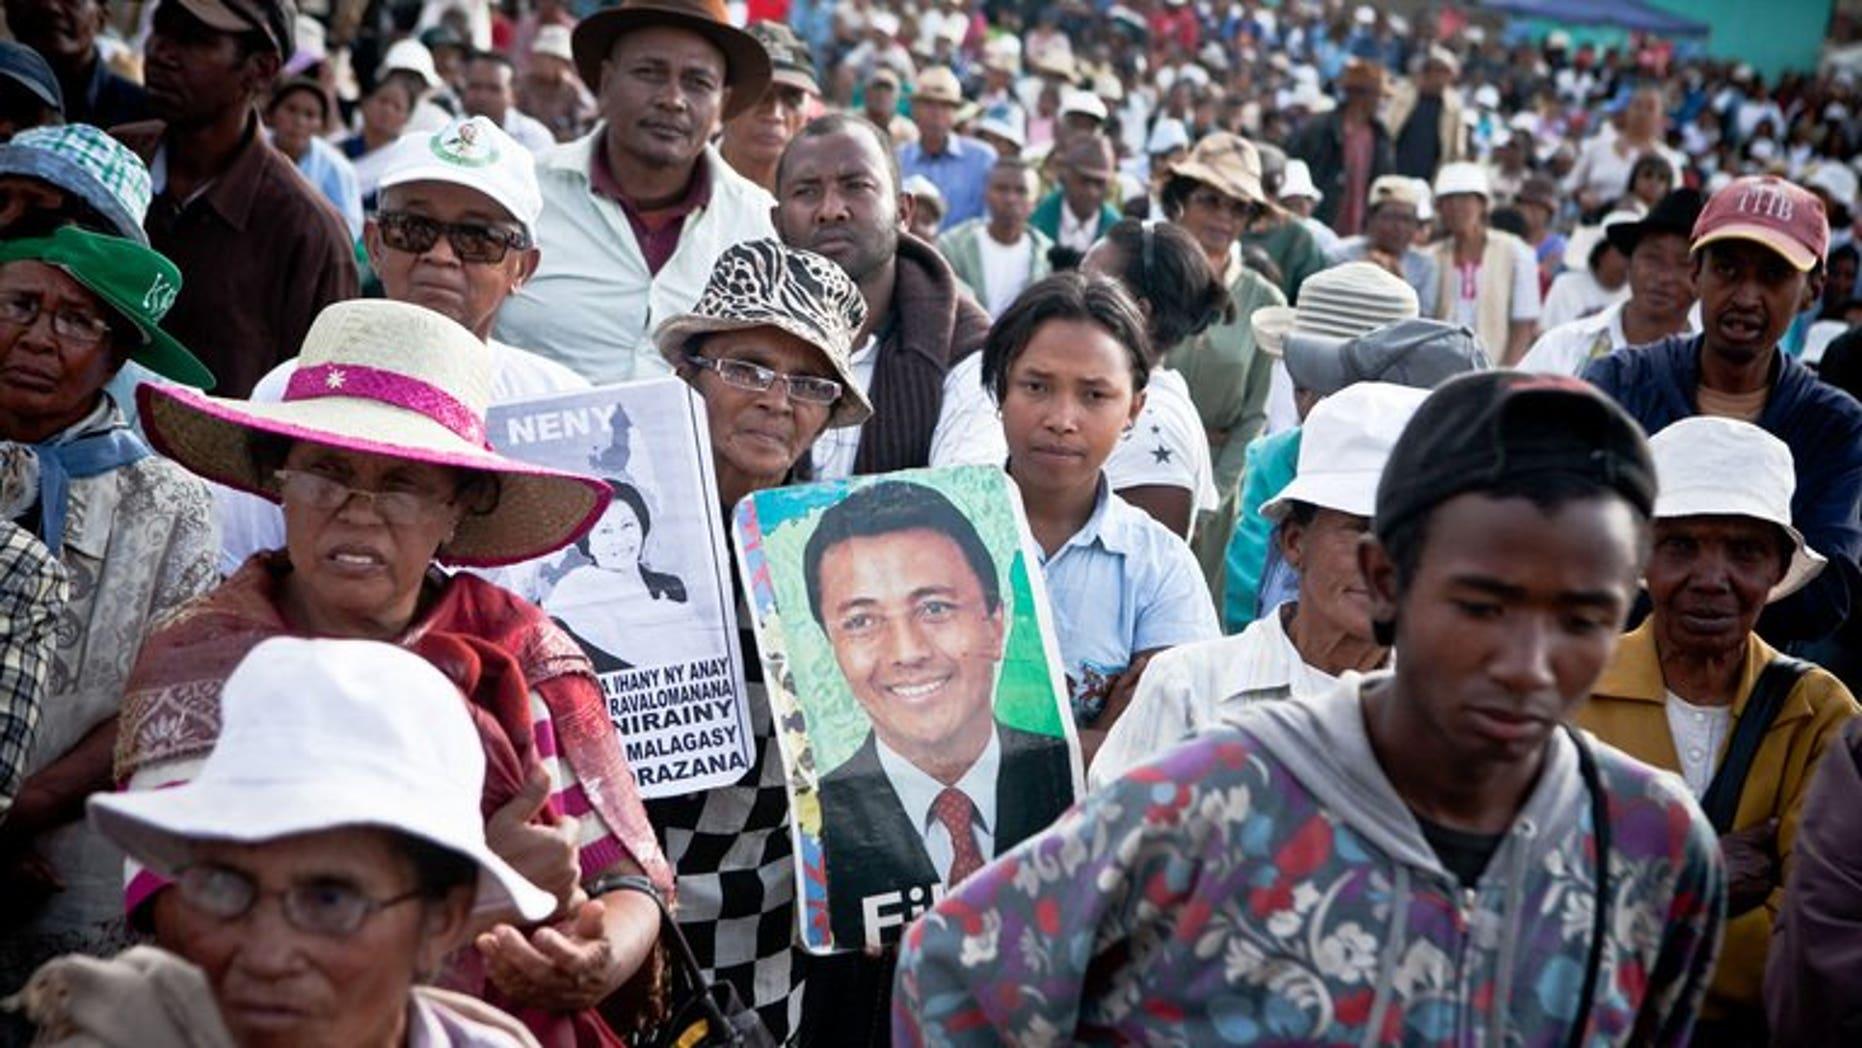 Supporters of ousted Madagascan President Marc Ravalomanana, Antananarivo, September 14, 2014